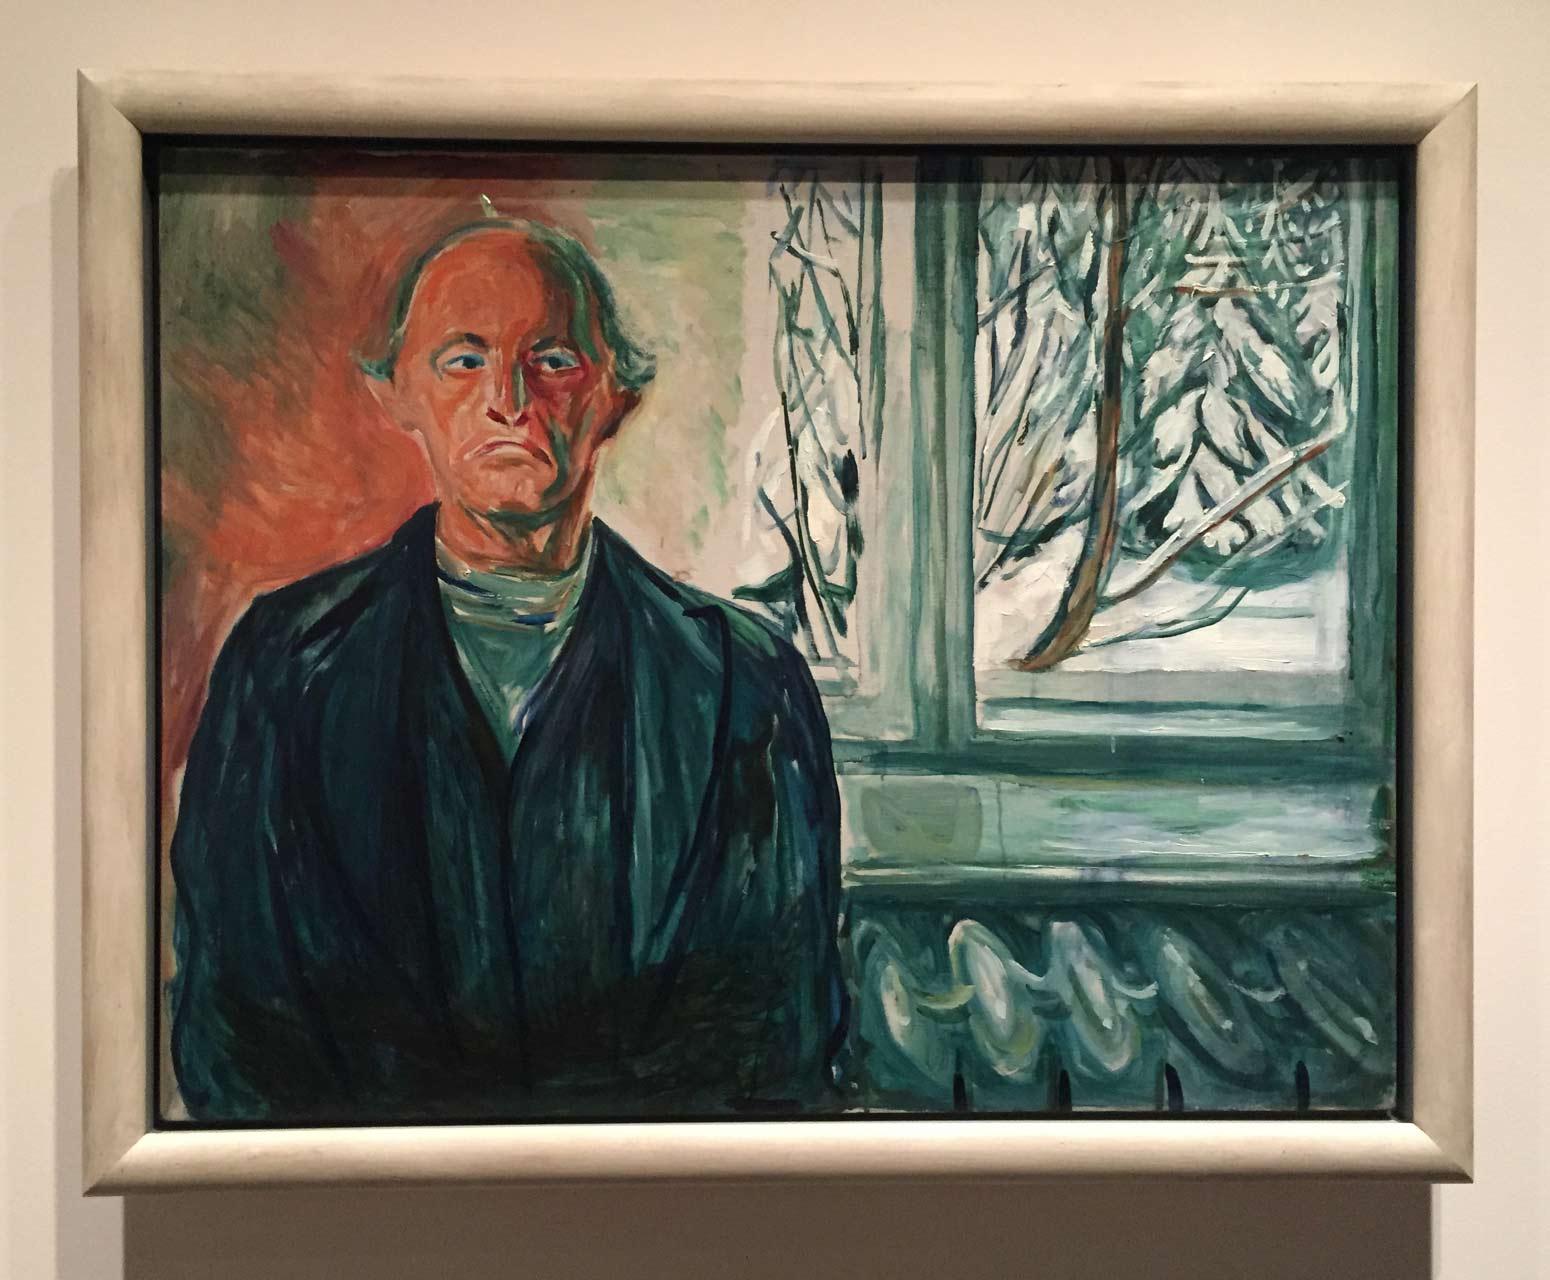 Edvard-Munch-Self-Portrait-by-Window-1940-Munch-Museum.jpg